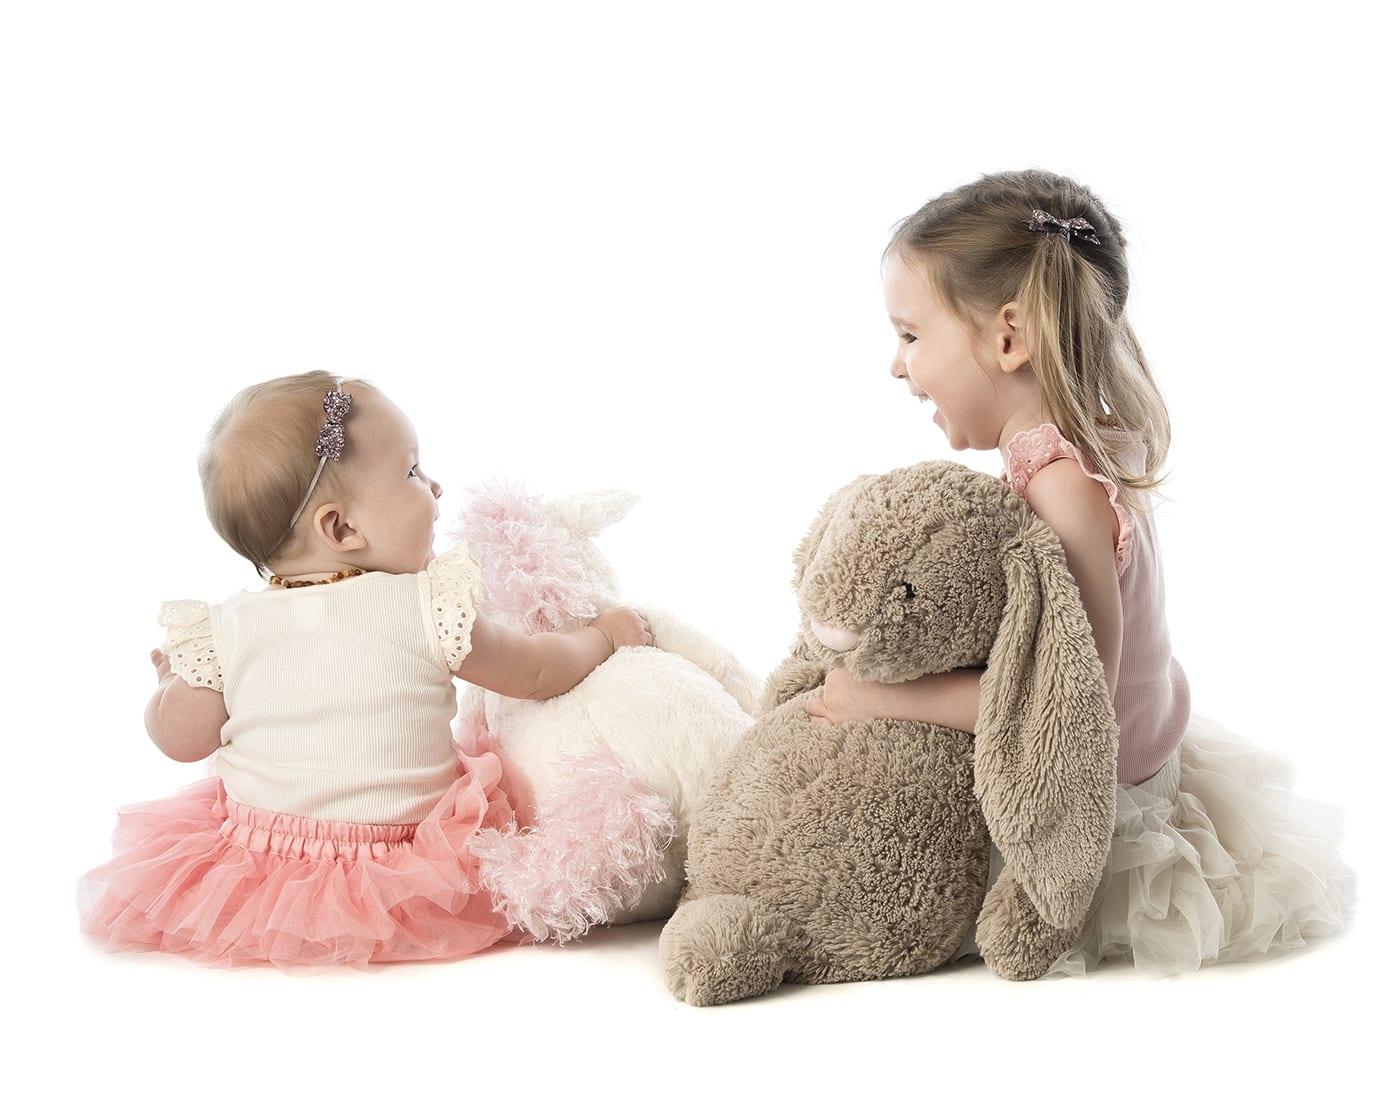 children-photos-twofrontteeth08